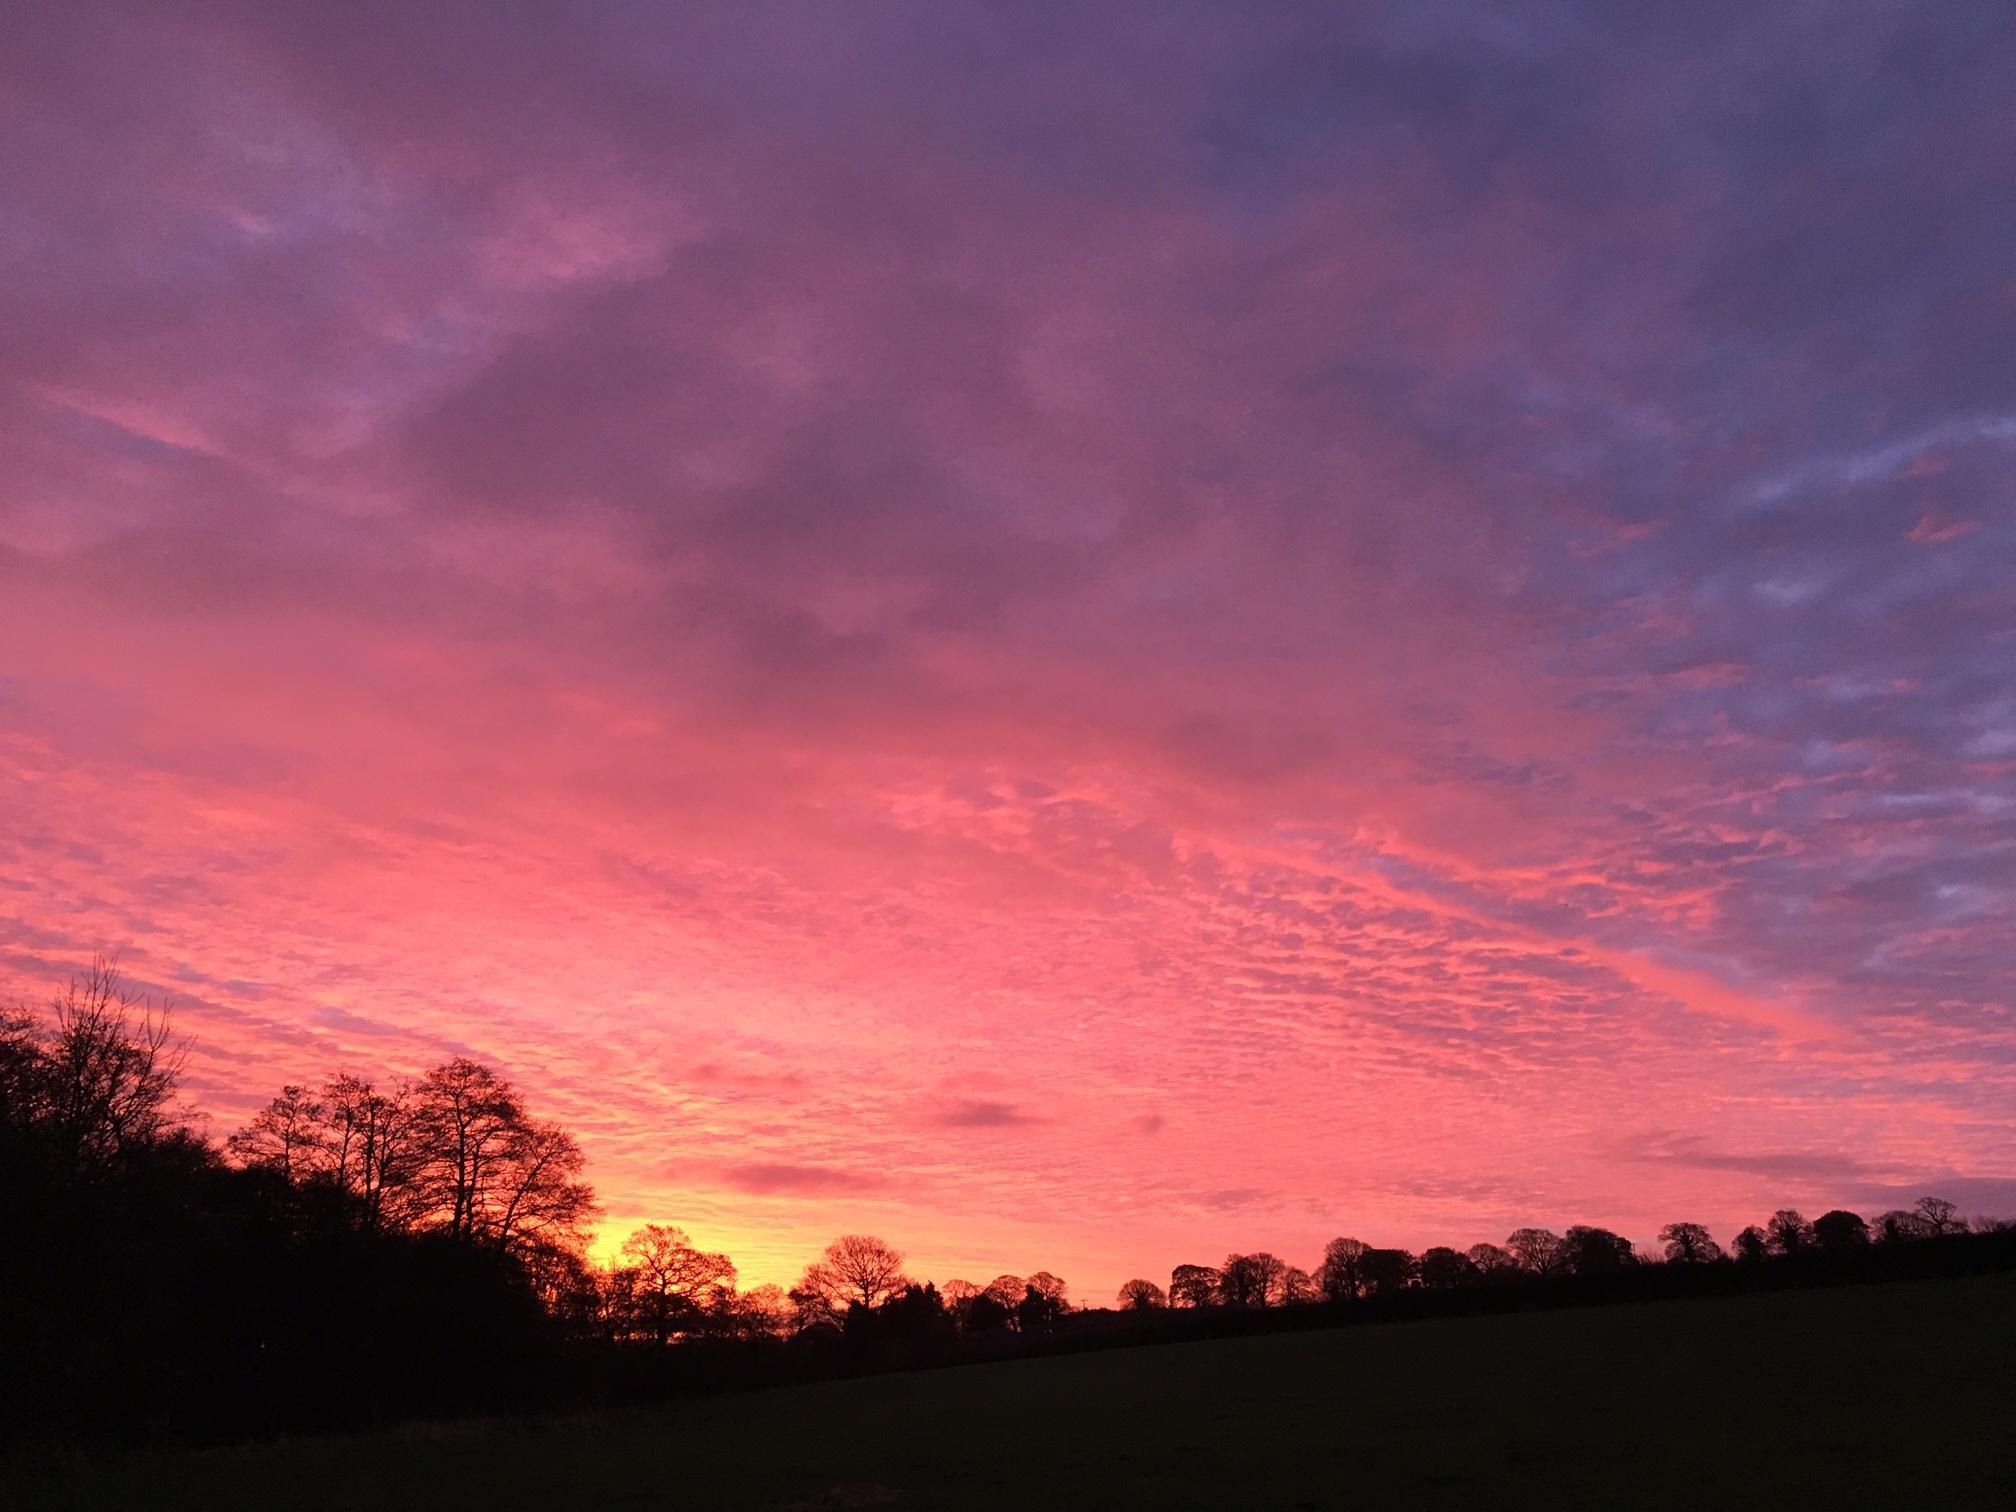 Red Sky In The Morning Shepherd S Warning Earnshaws